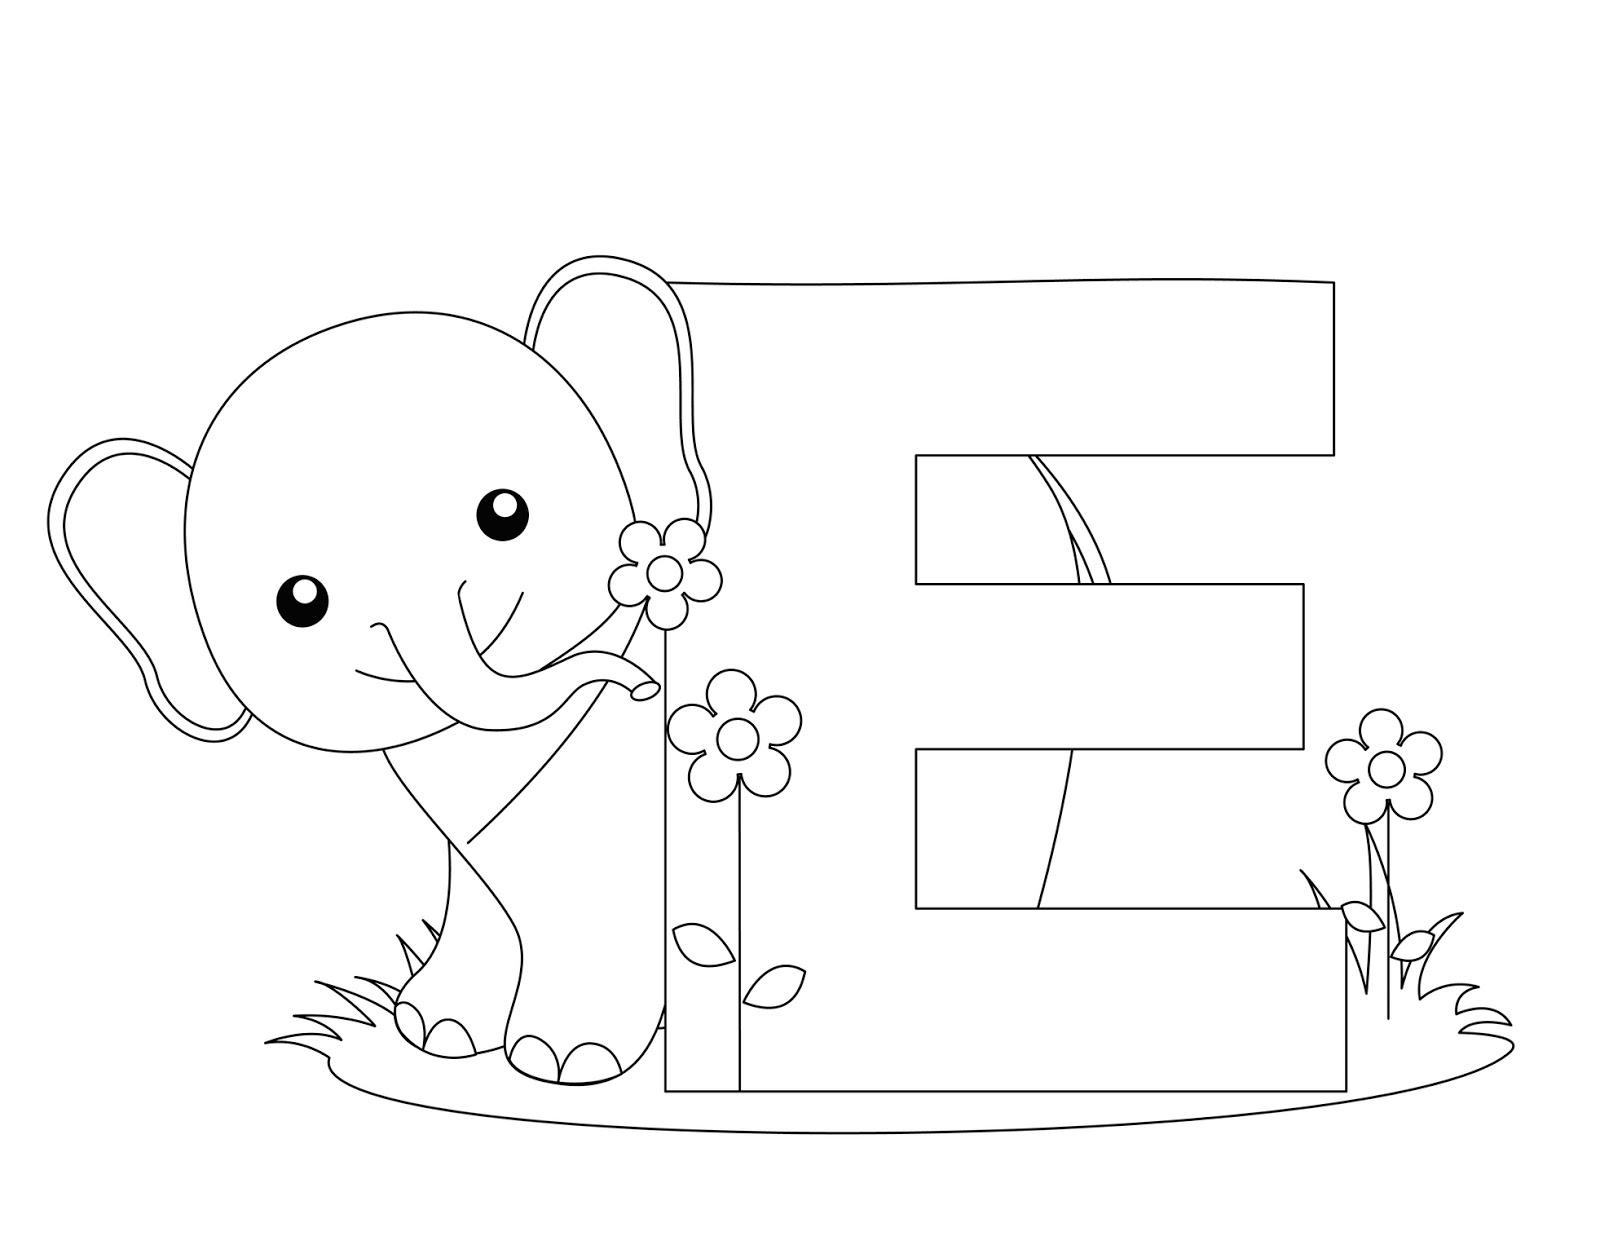 Desenho De Letra Z De Zoológico Para Colorir: Alfabeto Animais Zoológico Para Colorir Em Inglês